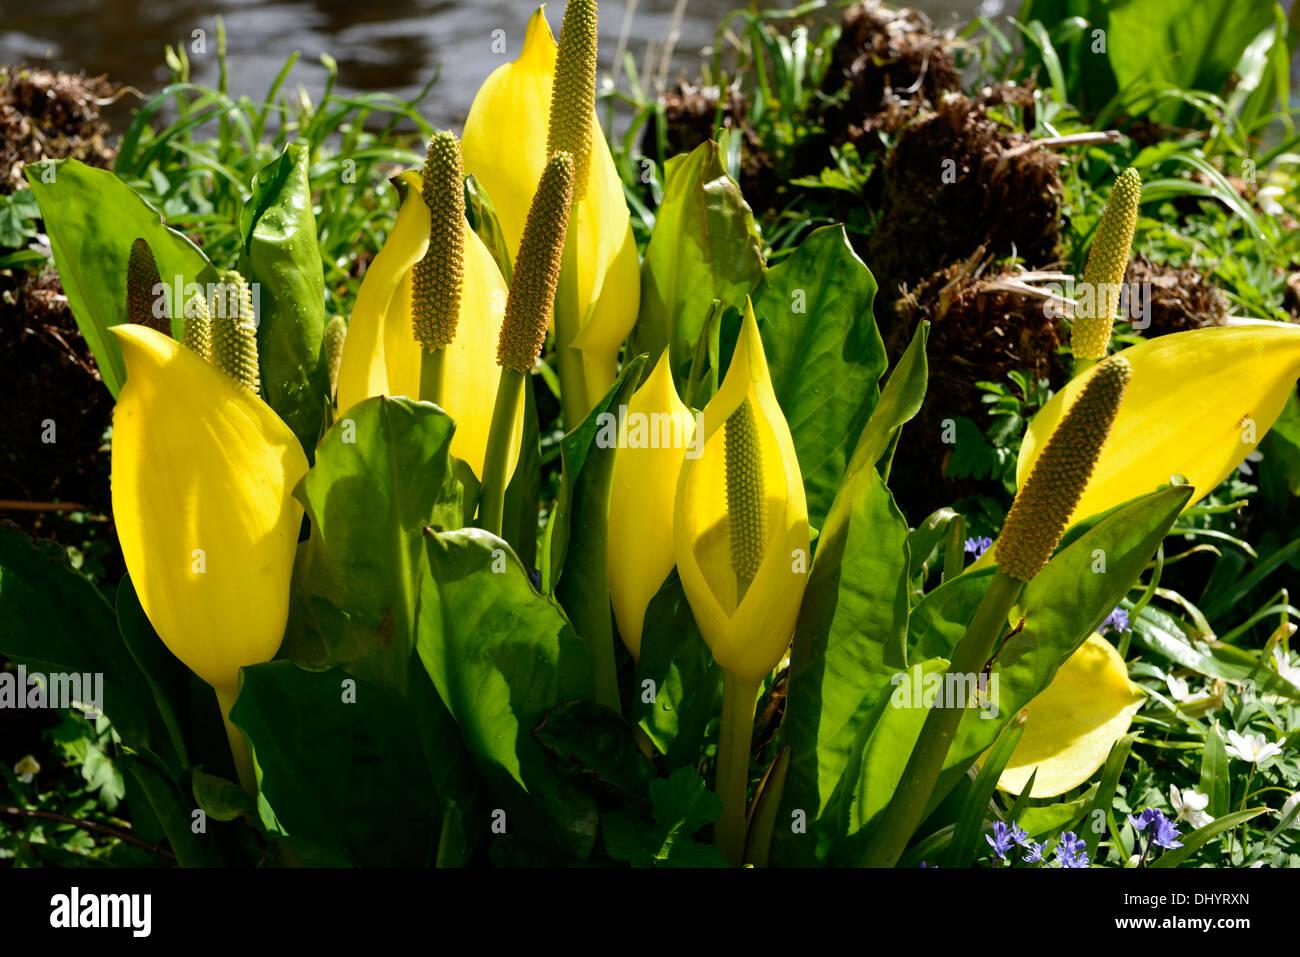 Lysichiton americanus yellow skunk cabbage flowers flowering bloom lysichiton americanus yellow skunk cabbage flowers flowering bloom blooming spring perennials bog water aquatic plants mightylinksfo